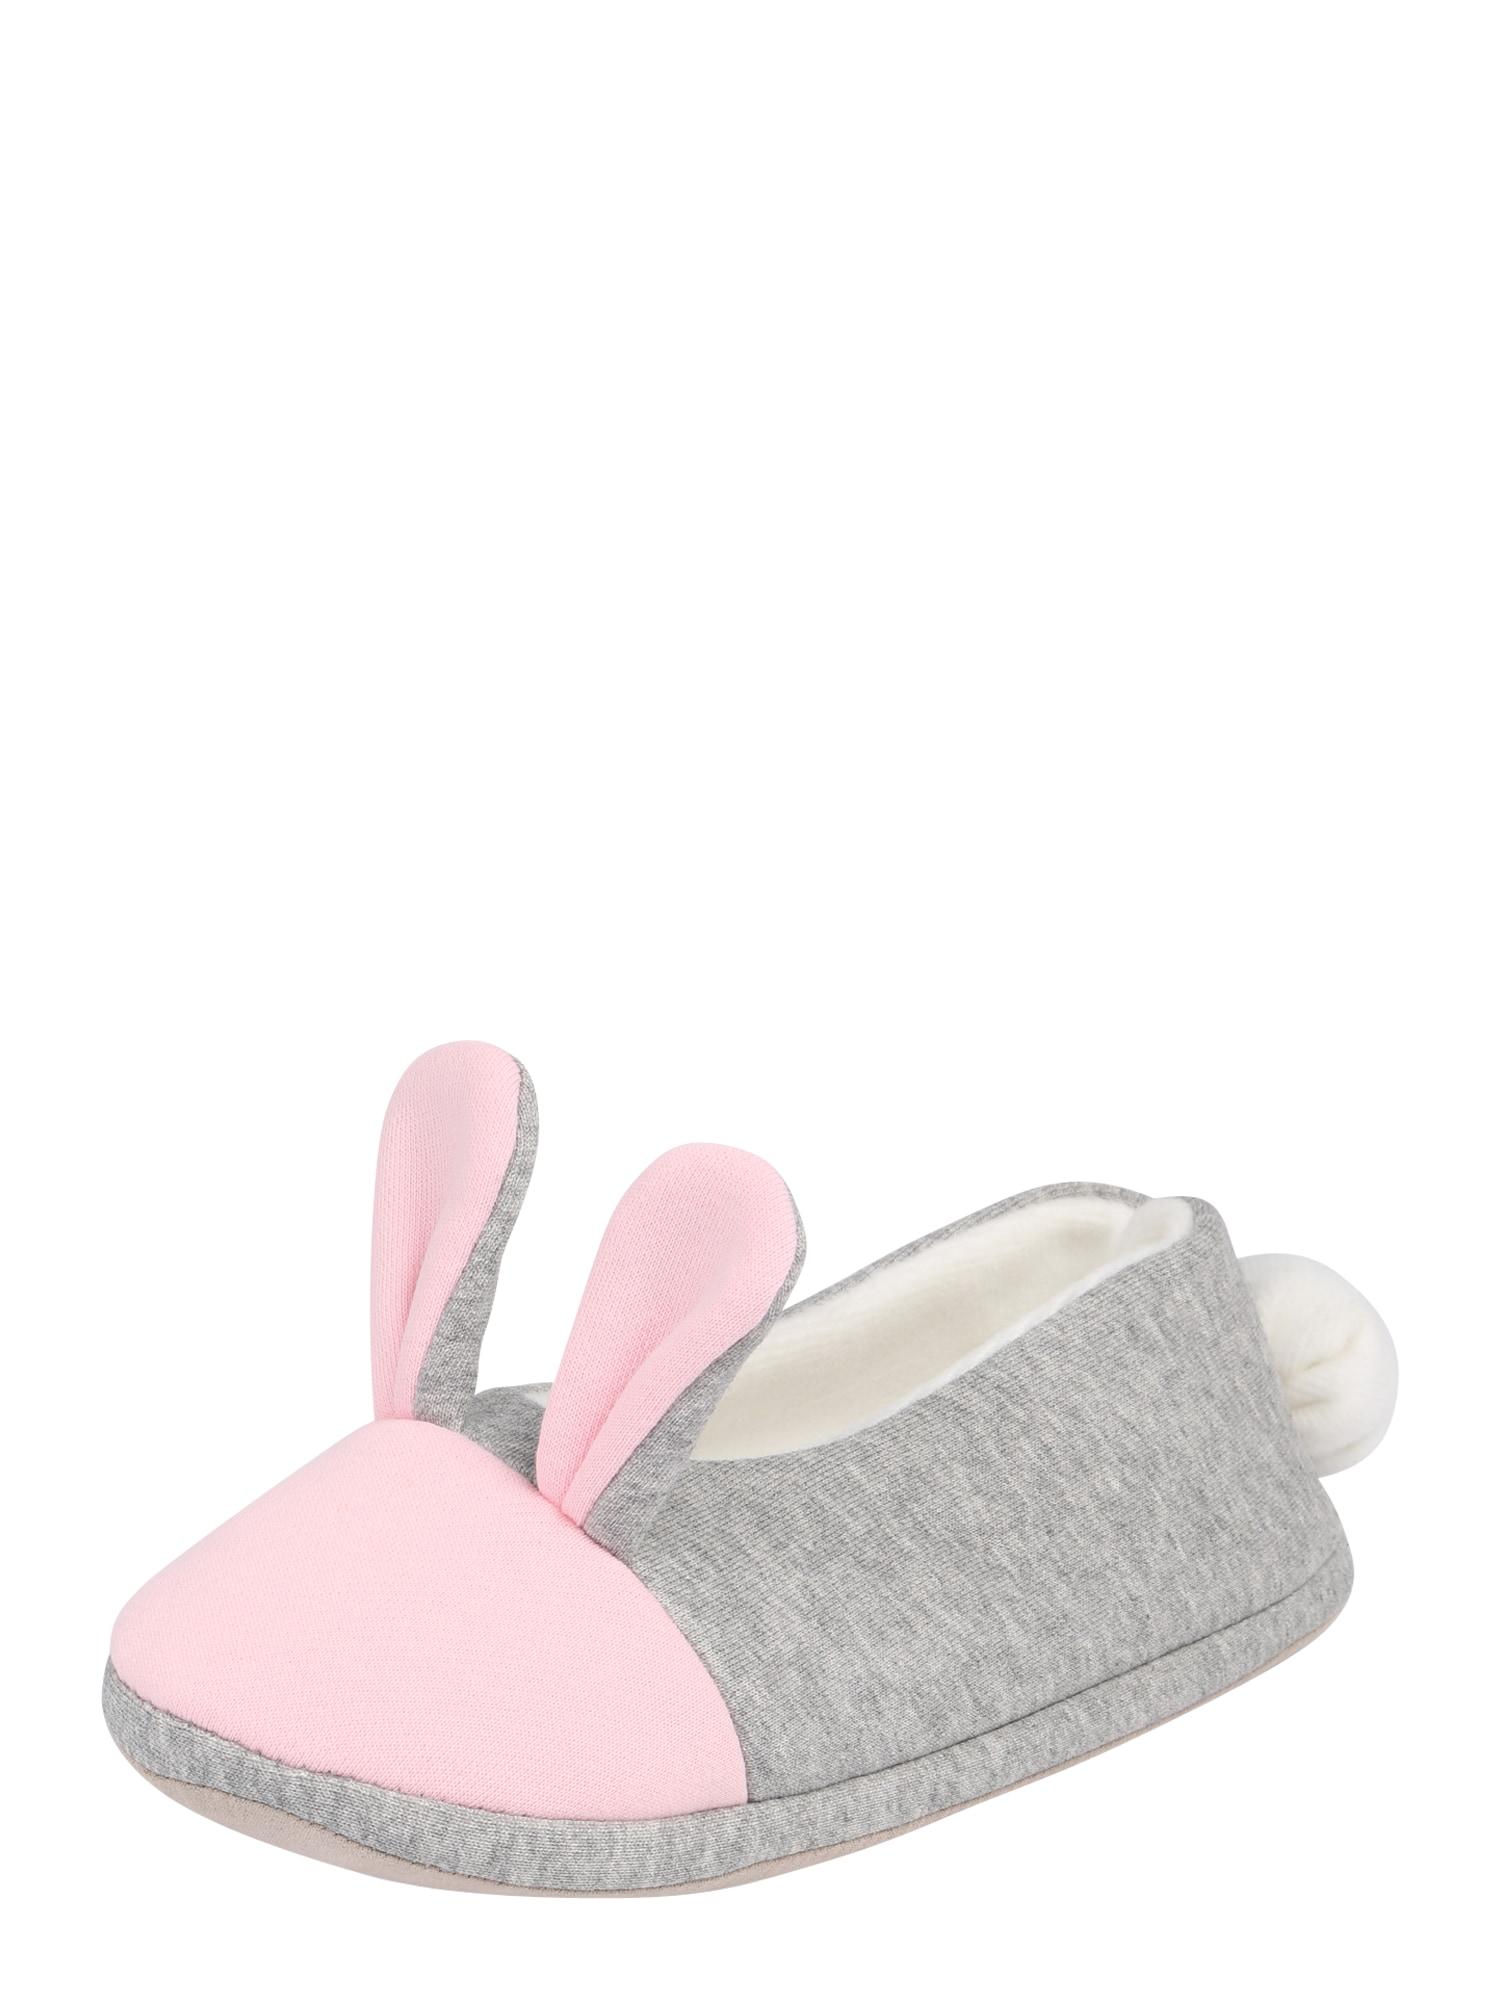 Ťapky Bunny  šedá  růžová  bílá BURLINGTON